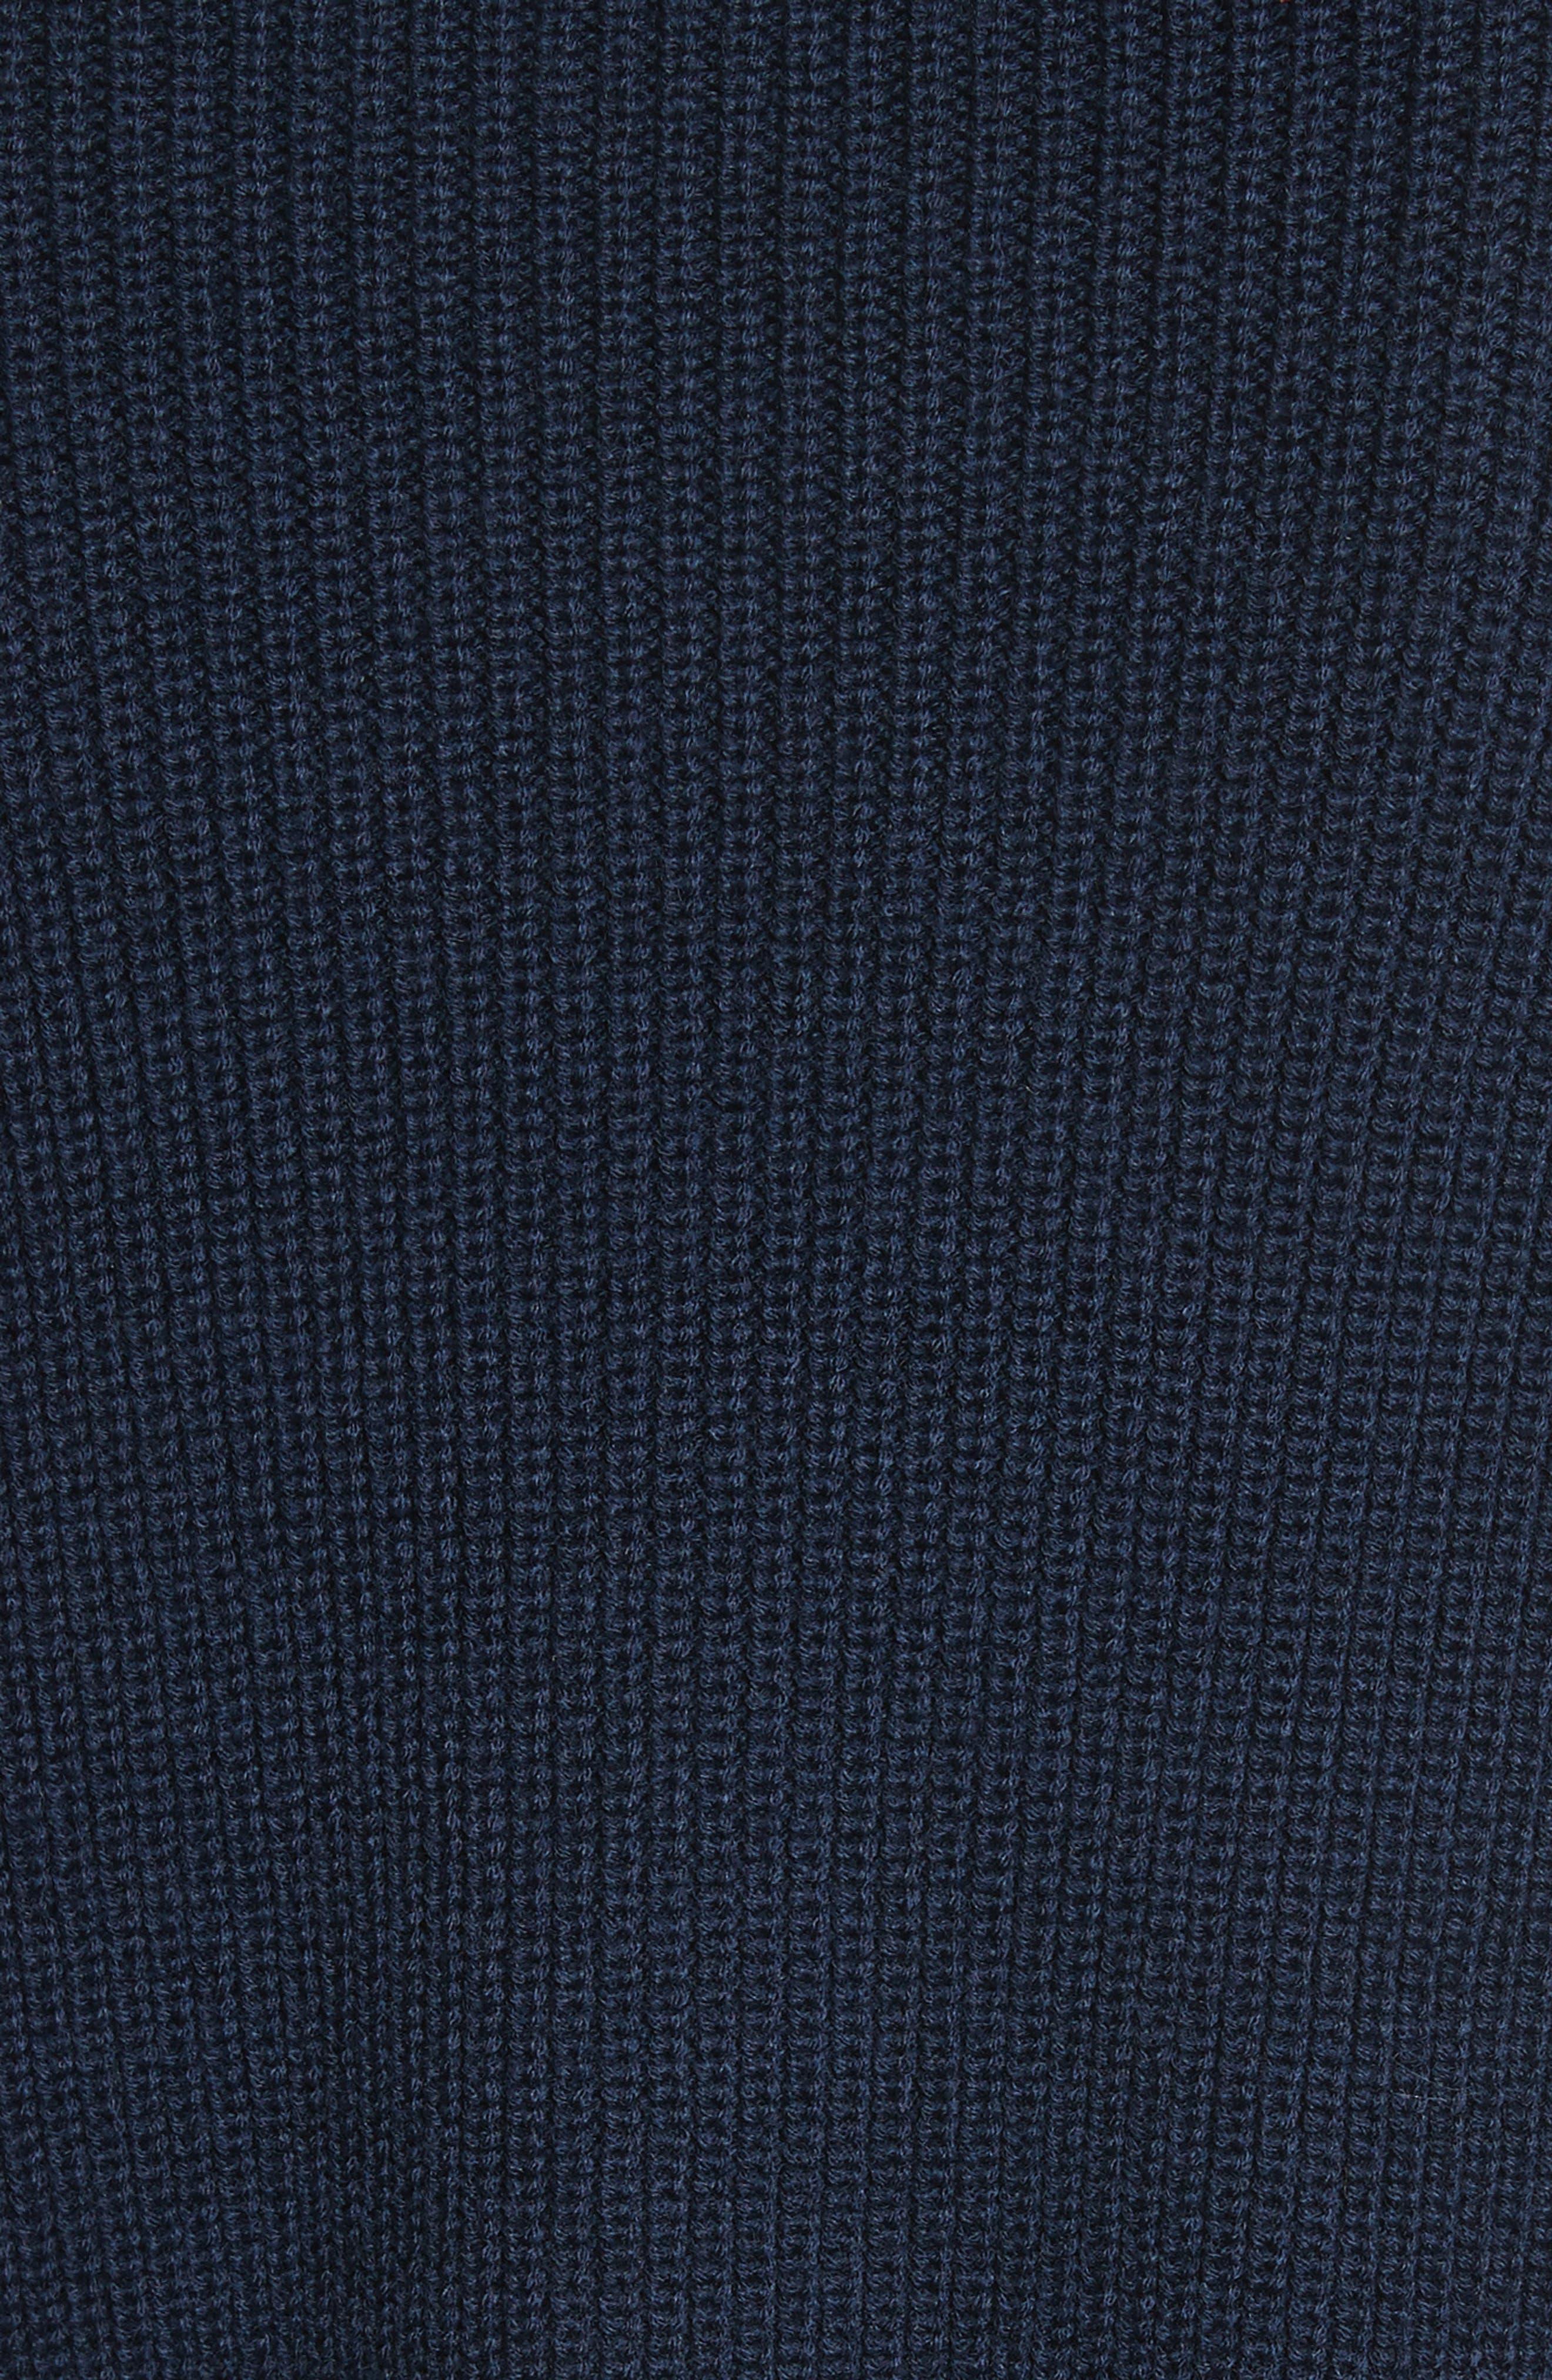 Bateau Neck Merino Wool Blend Sweater,                             Alternate thumbnail 5, color,                             410